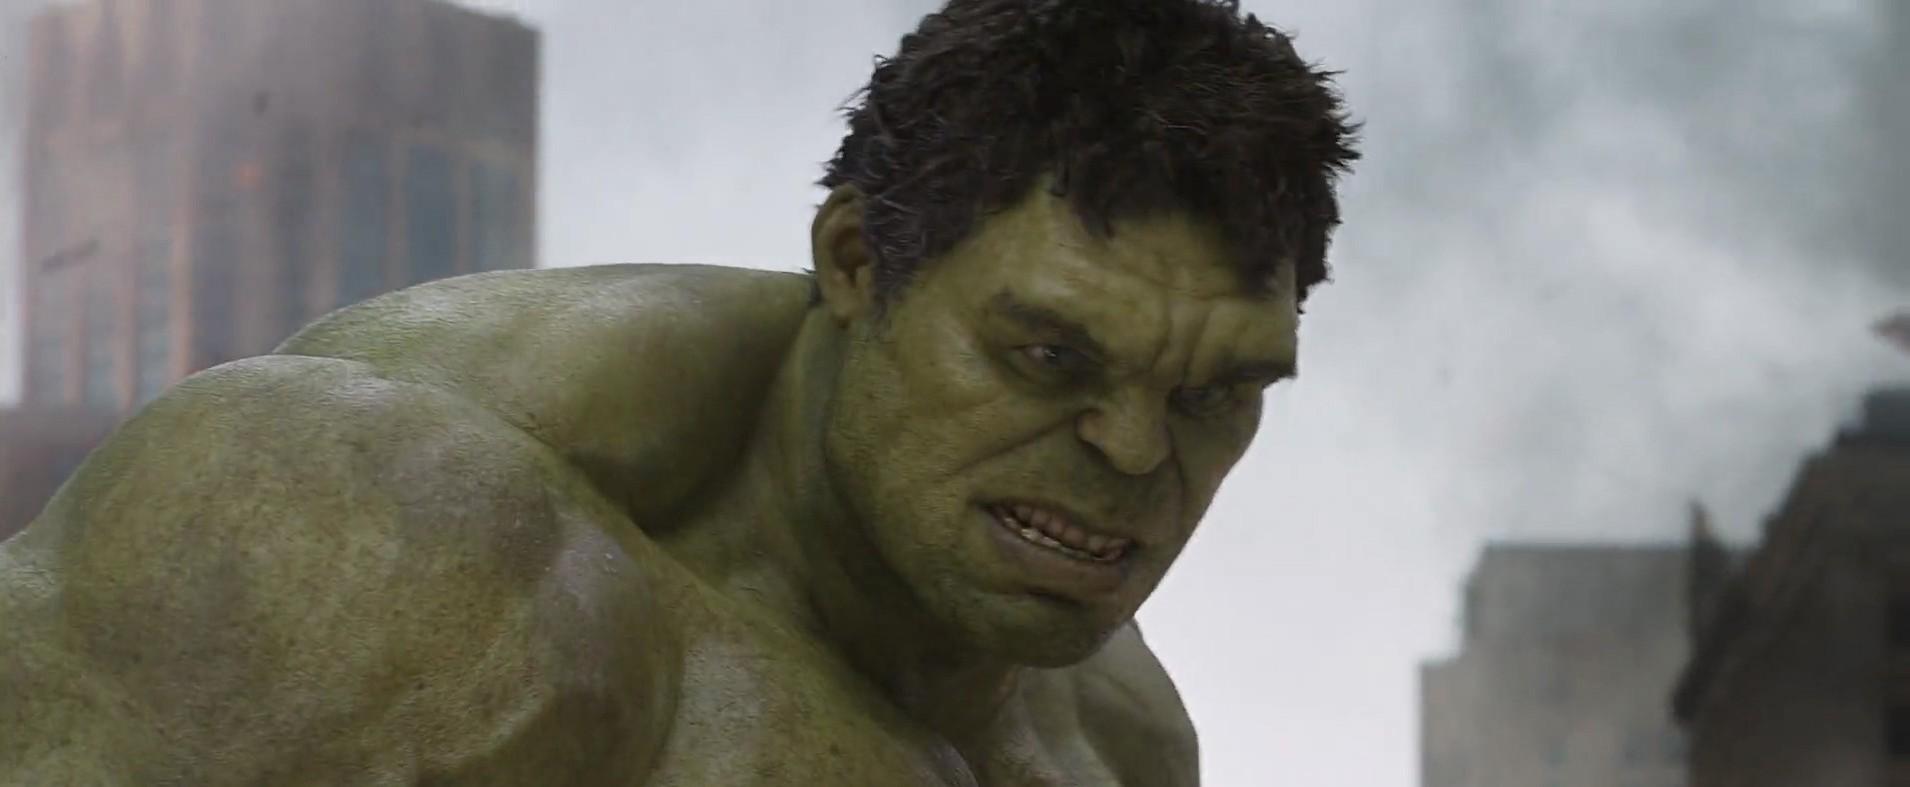 Good Hulk Movie Hulk Movie Overmental